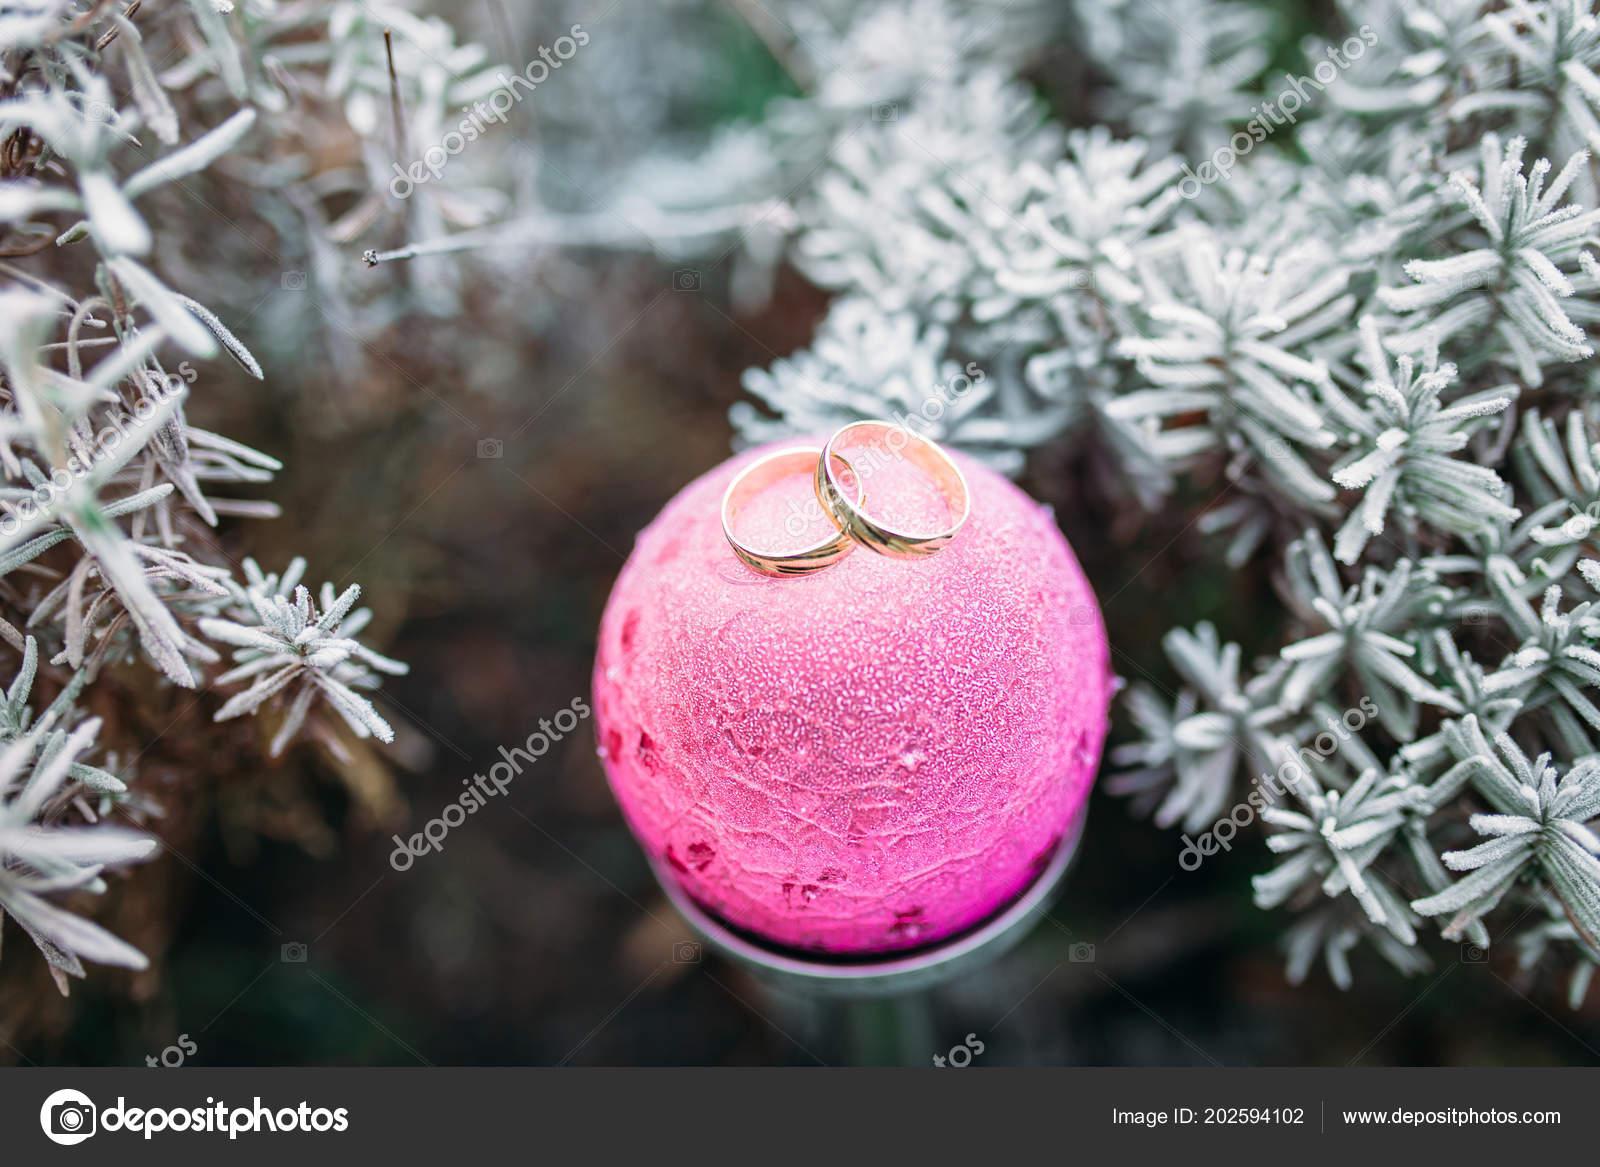 Wedding Rings Pink Christmas Ball Christmas Tree Snow Advertising ...